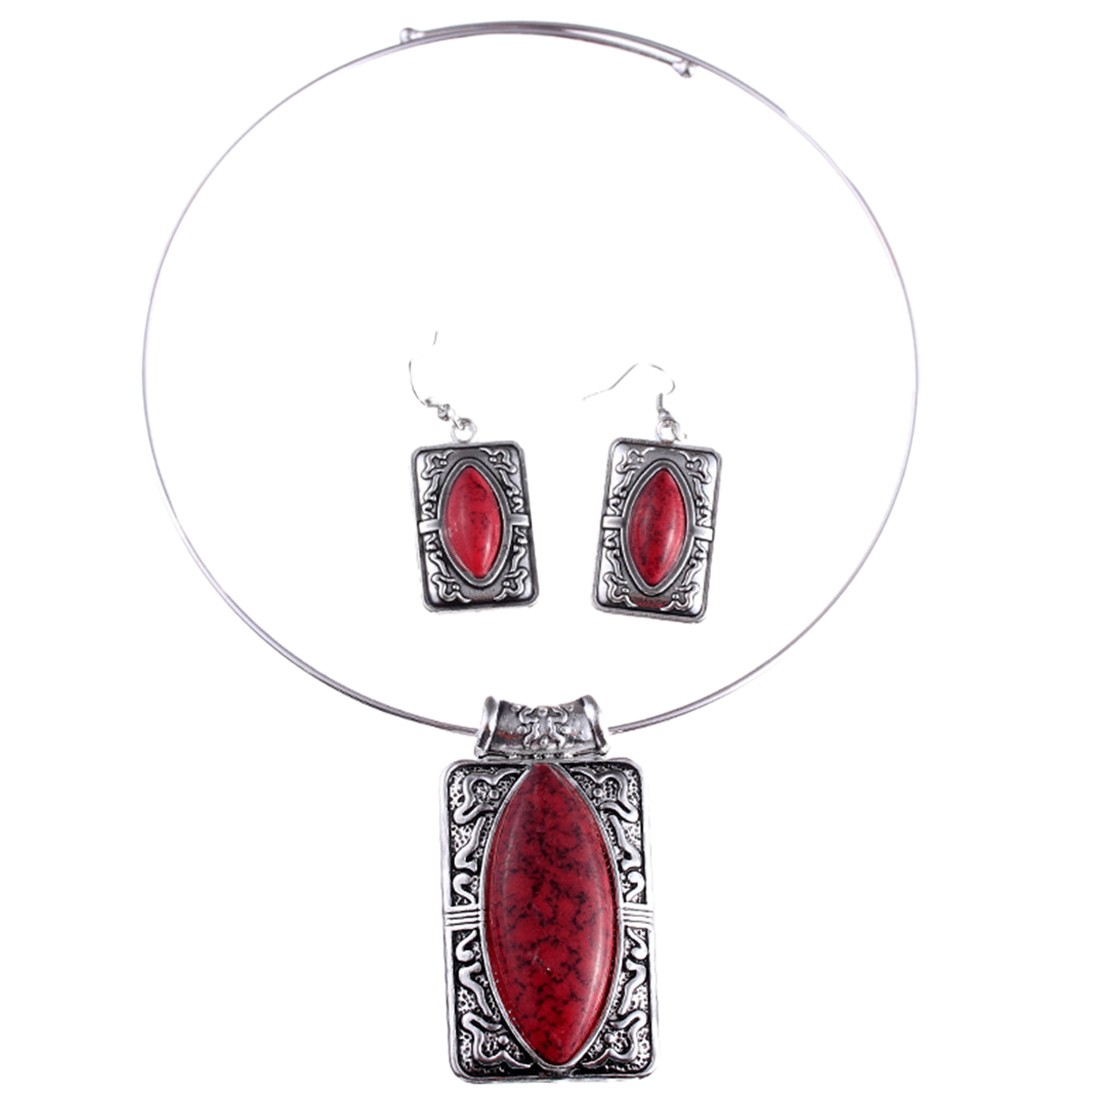 vintage style women rectangle pendant fashion jewelry set necklace earring